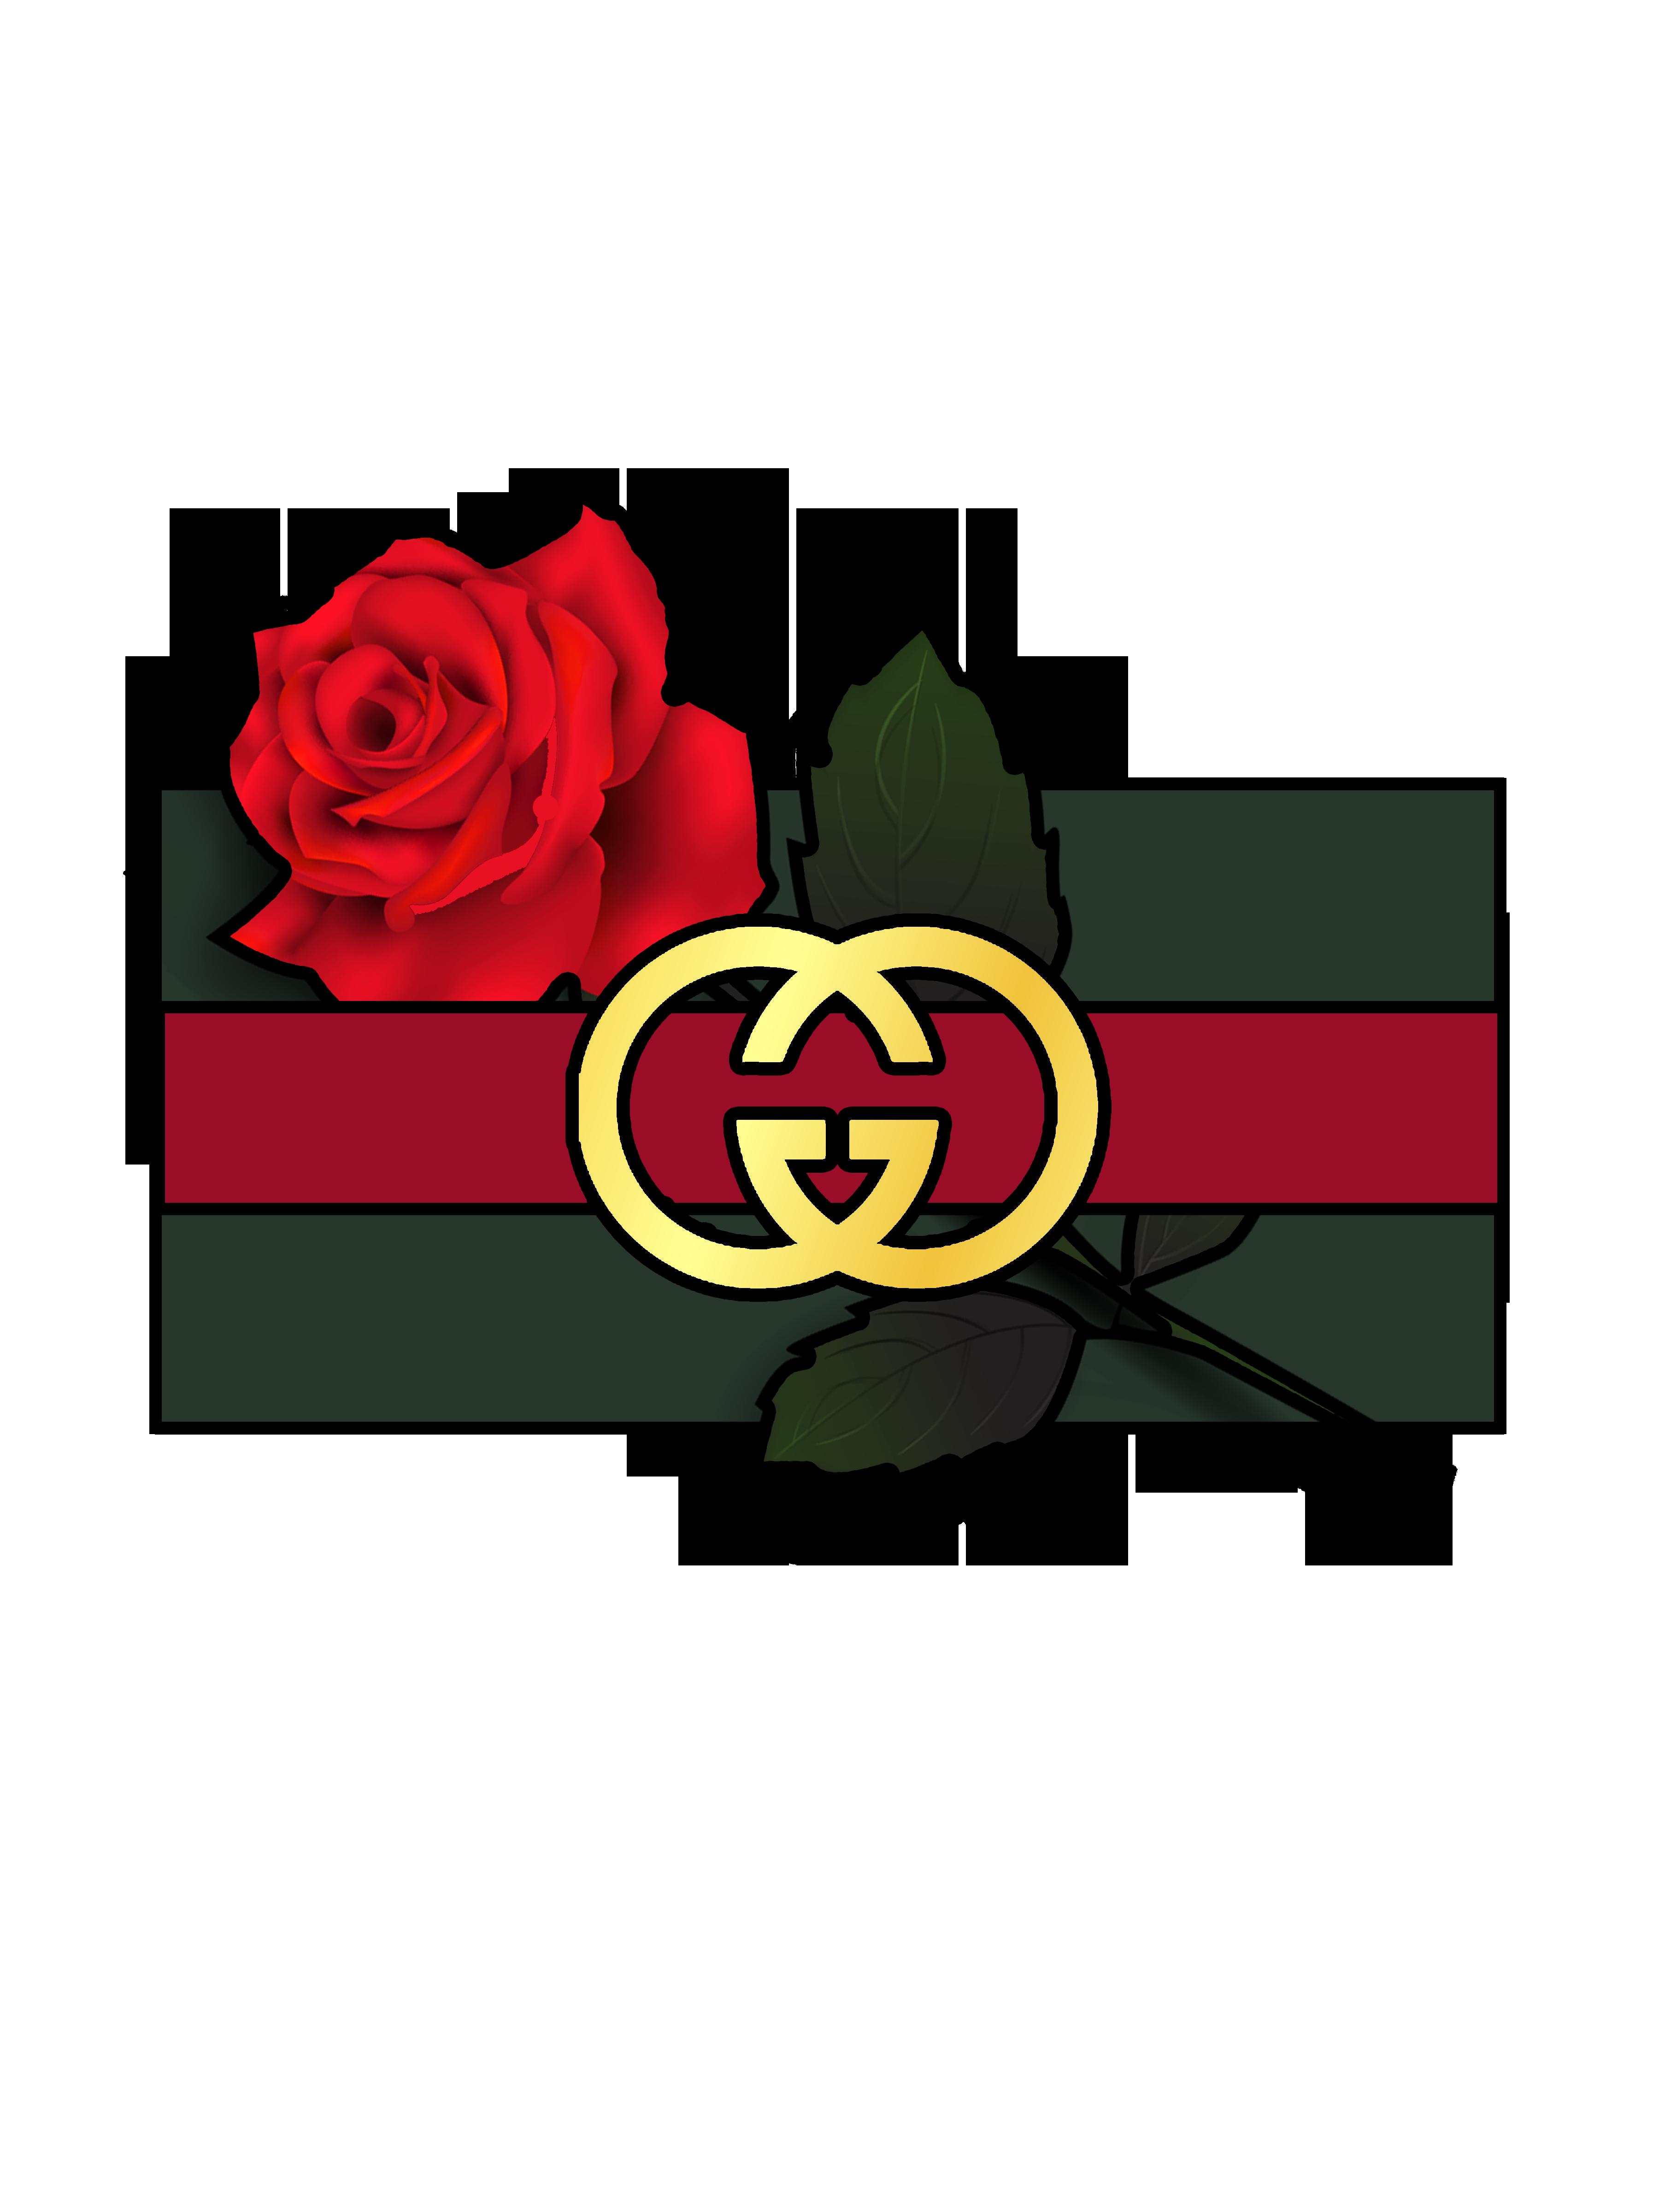 little gucci logo i made